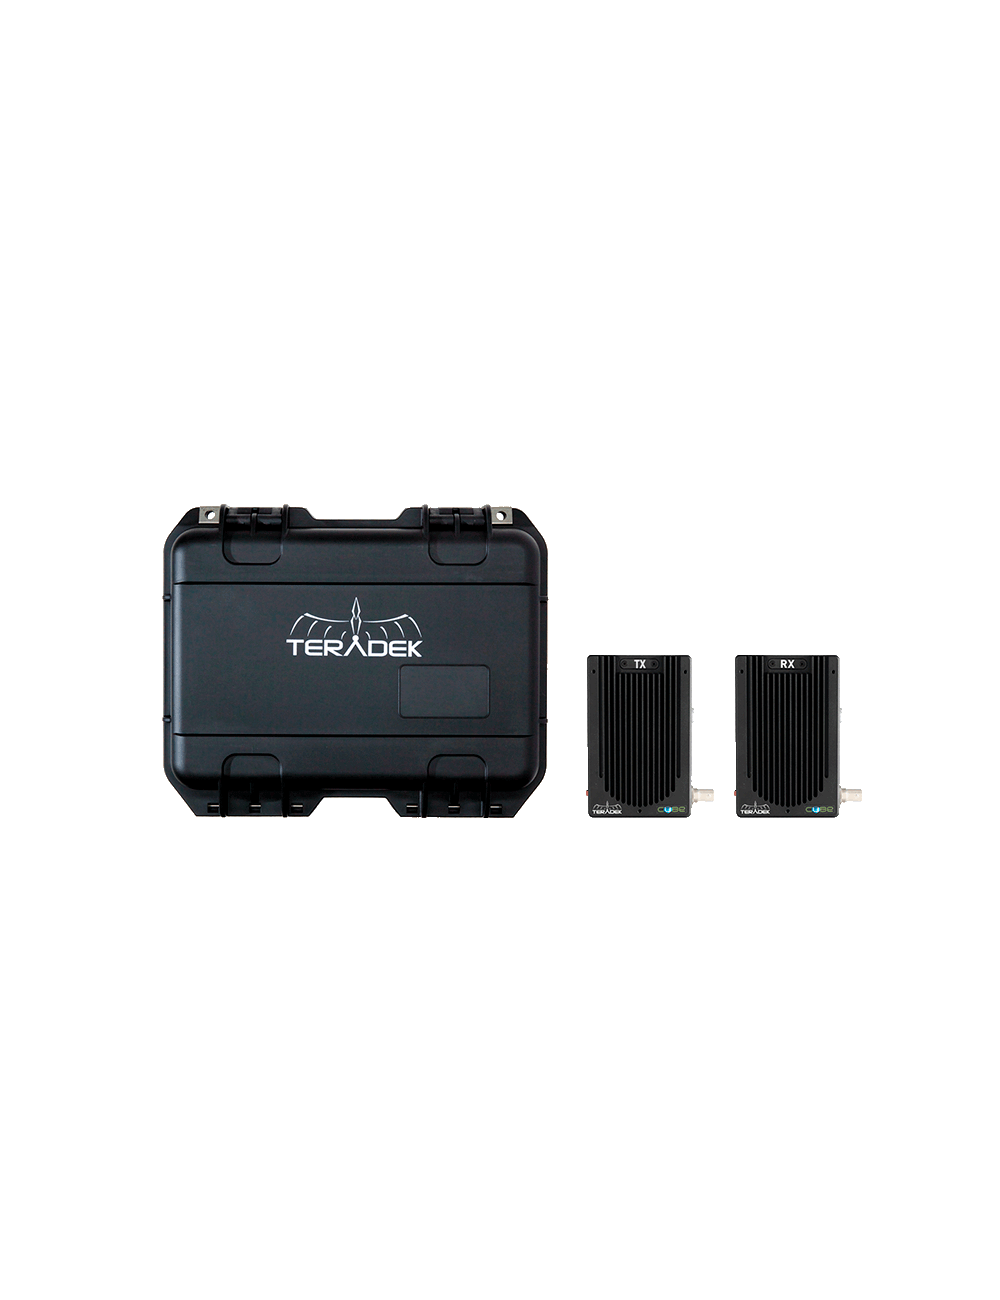 Teradek Cubelet 705/725 Moncada